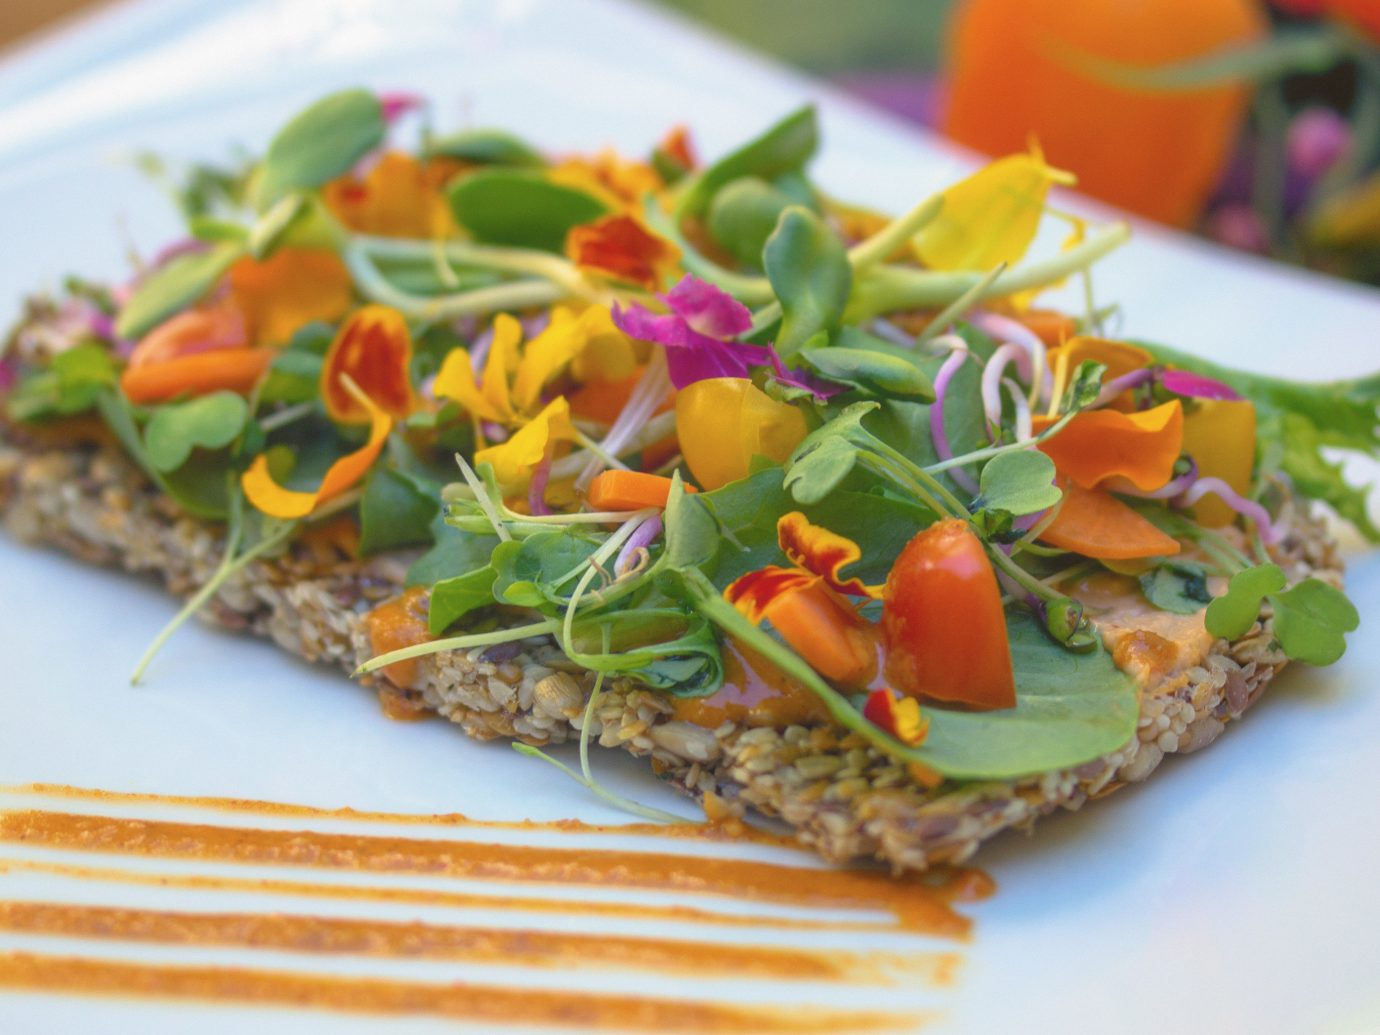 Health + Wellness Meditation Retreats Offbeat Spa Retreats Yoga Retreats food plate dish produce plant vegetable cuisine meal vegetarian food flowering plant fruit meat fresh